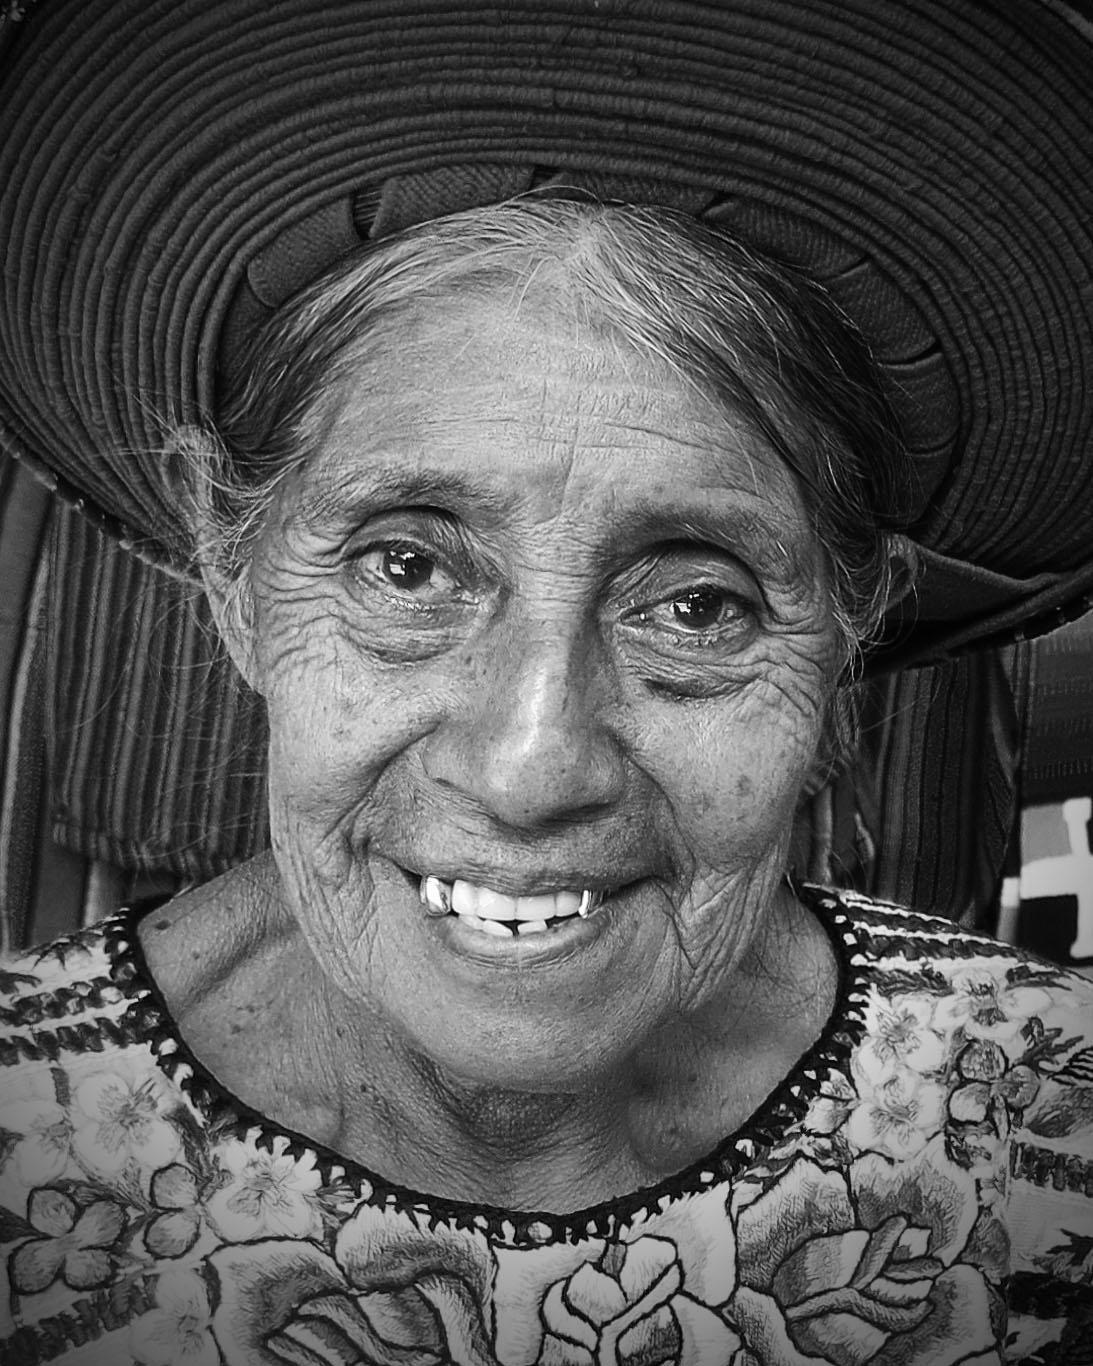 maya-elder-web1